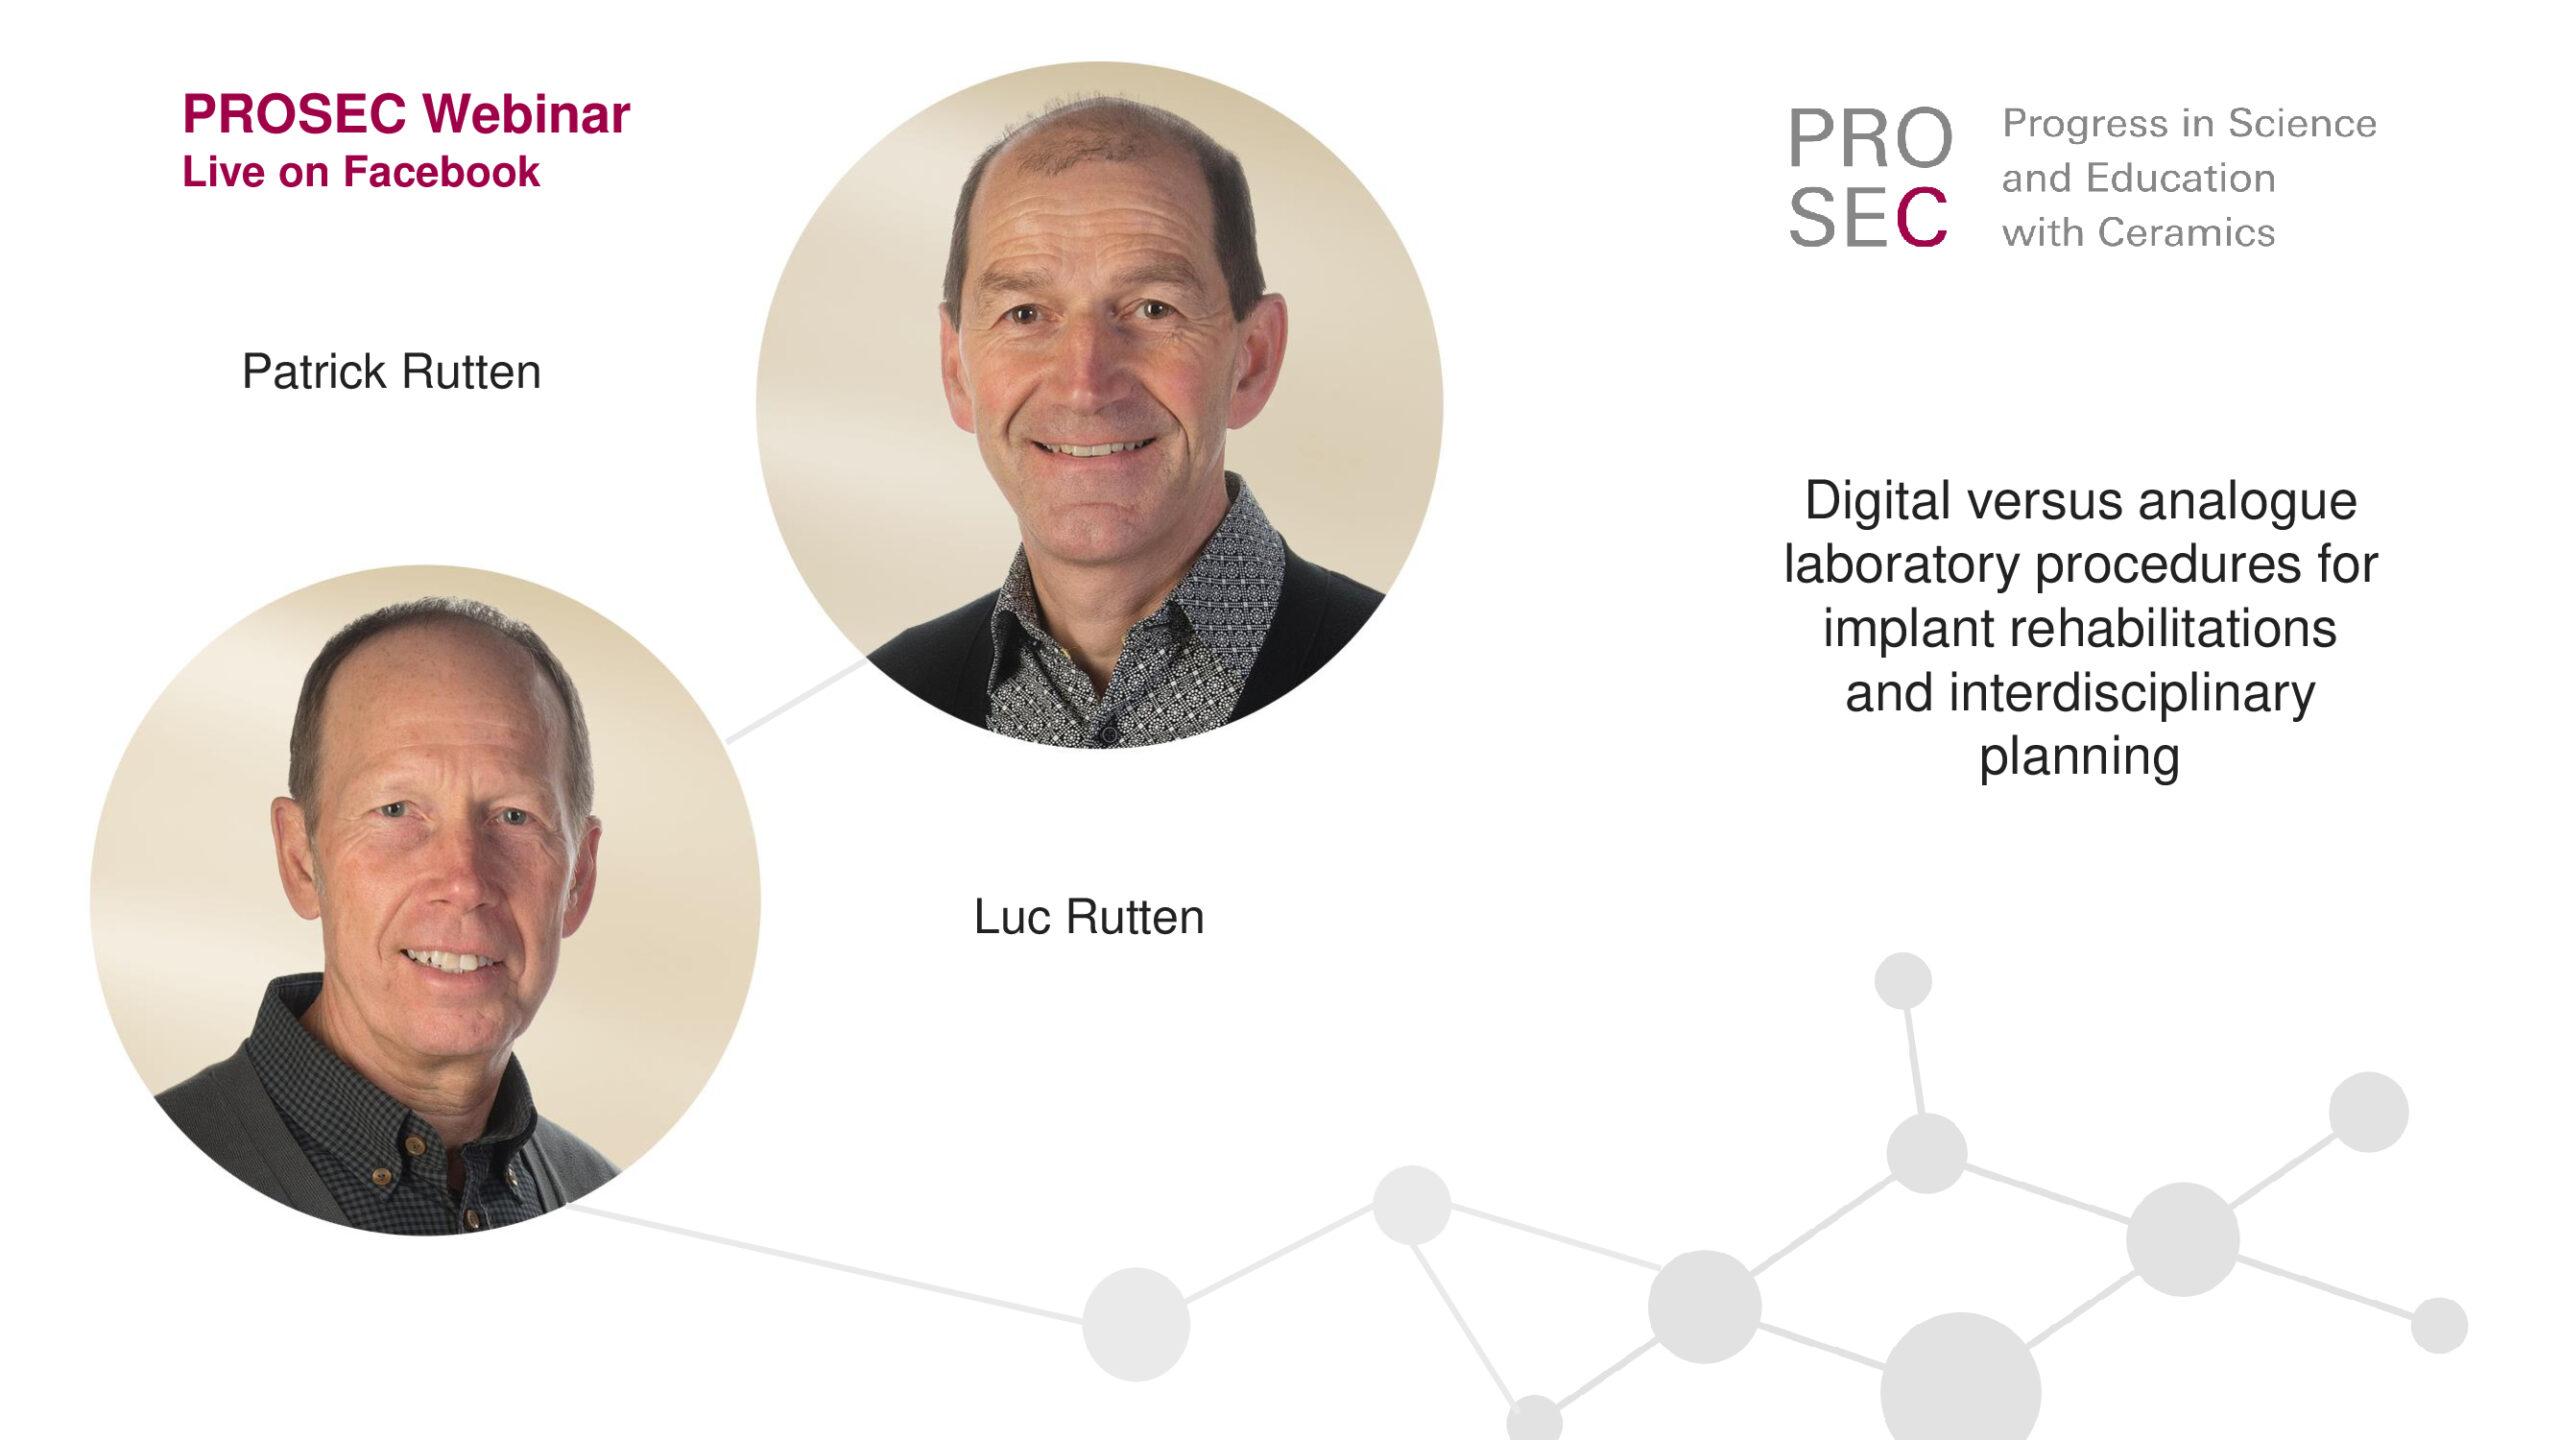 PROSEC Webinar with Patrick und Luc Rutten